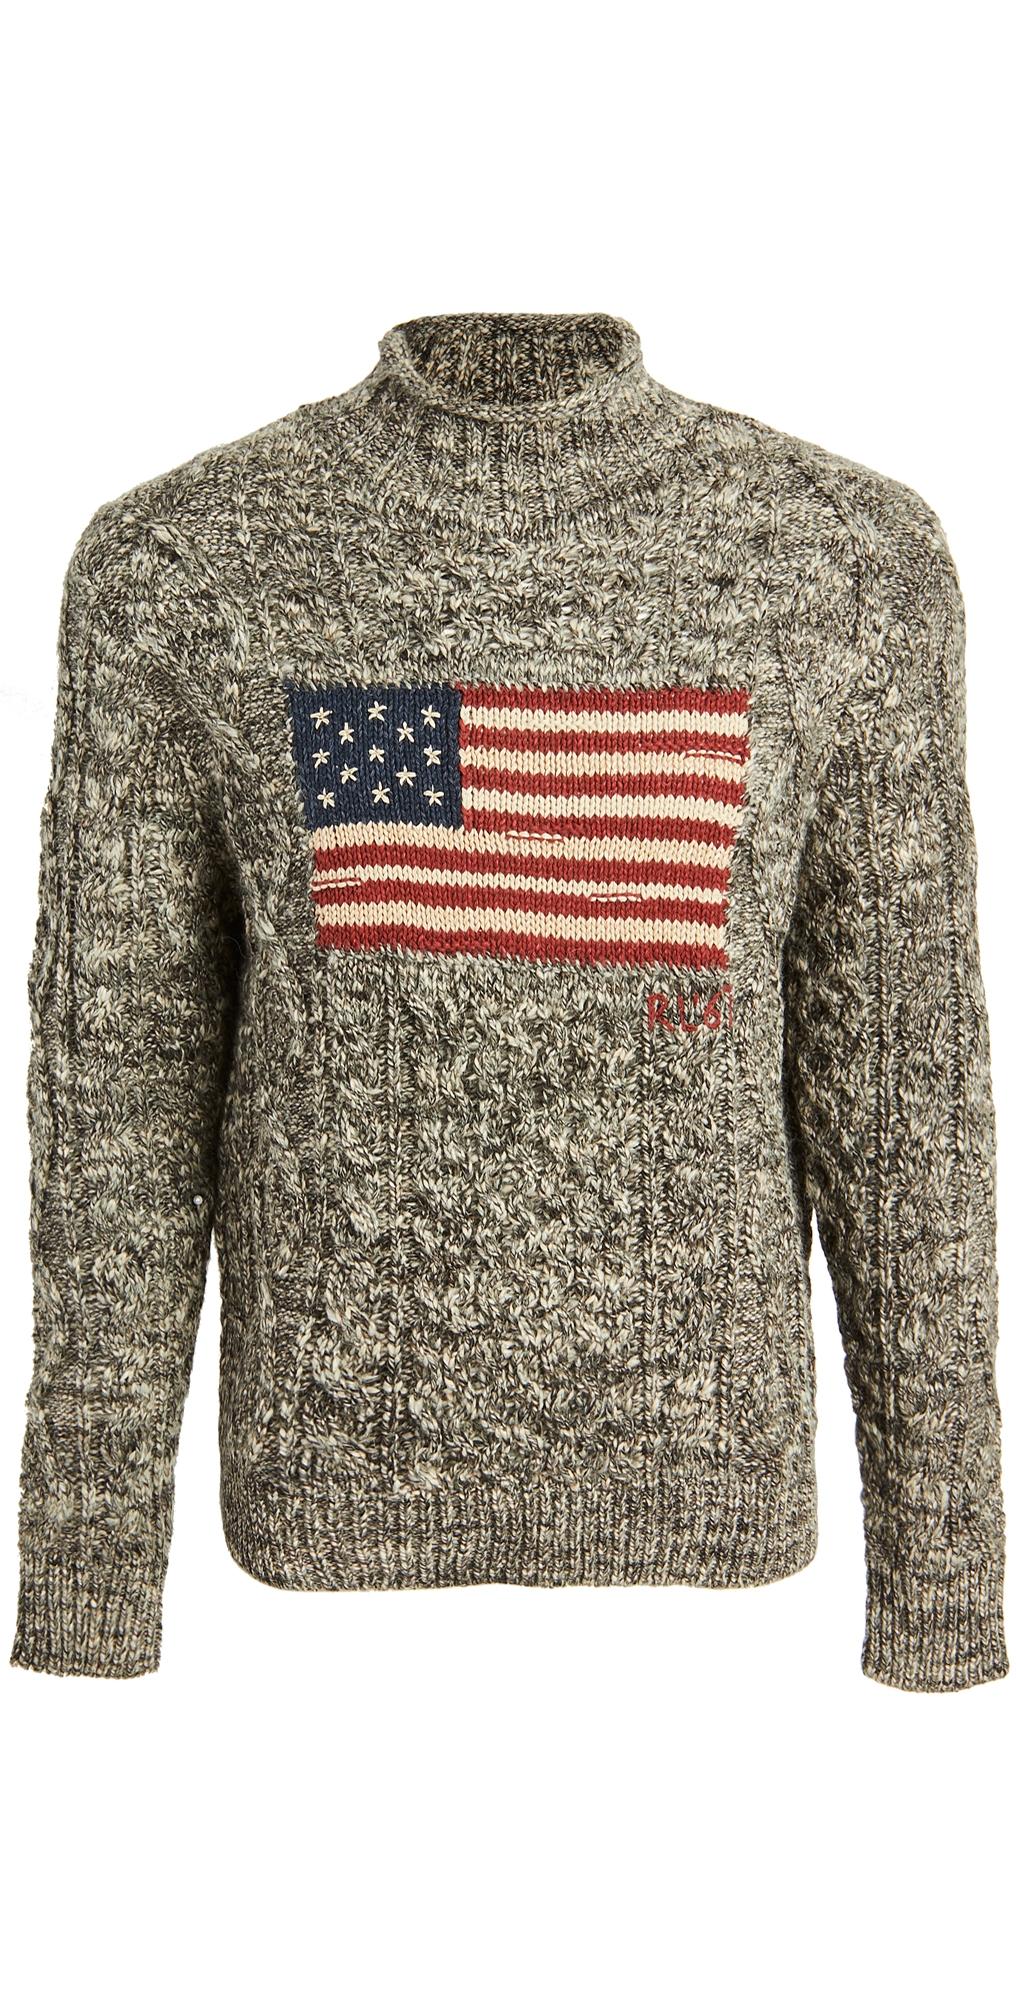 Polo Ralph Lauren Ragg Wool Flag Sweater